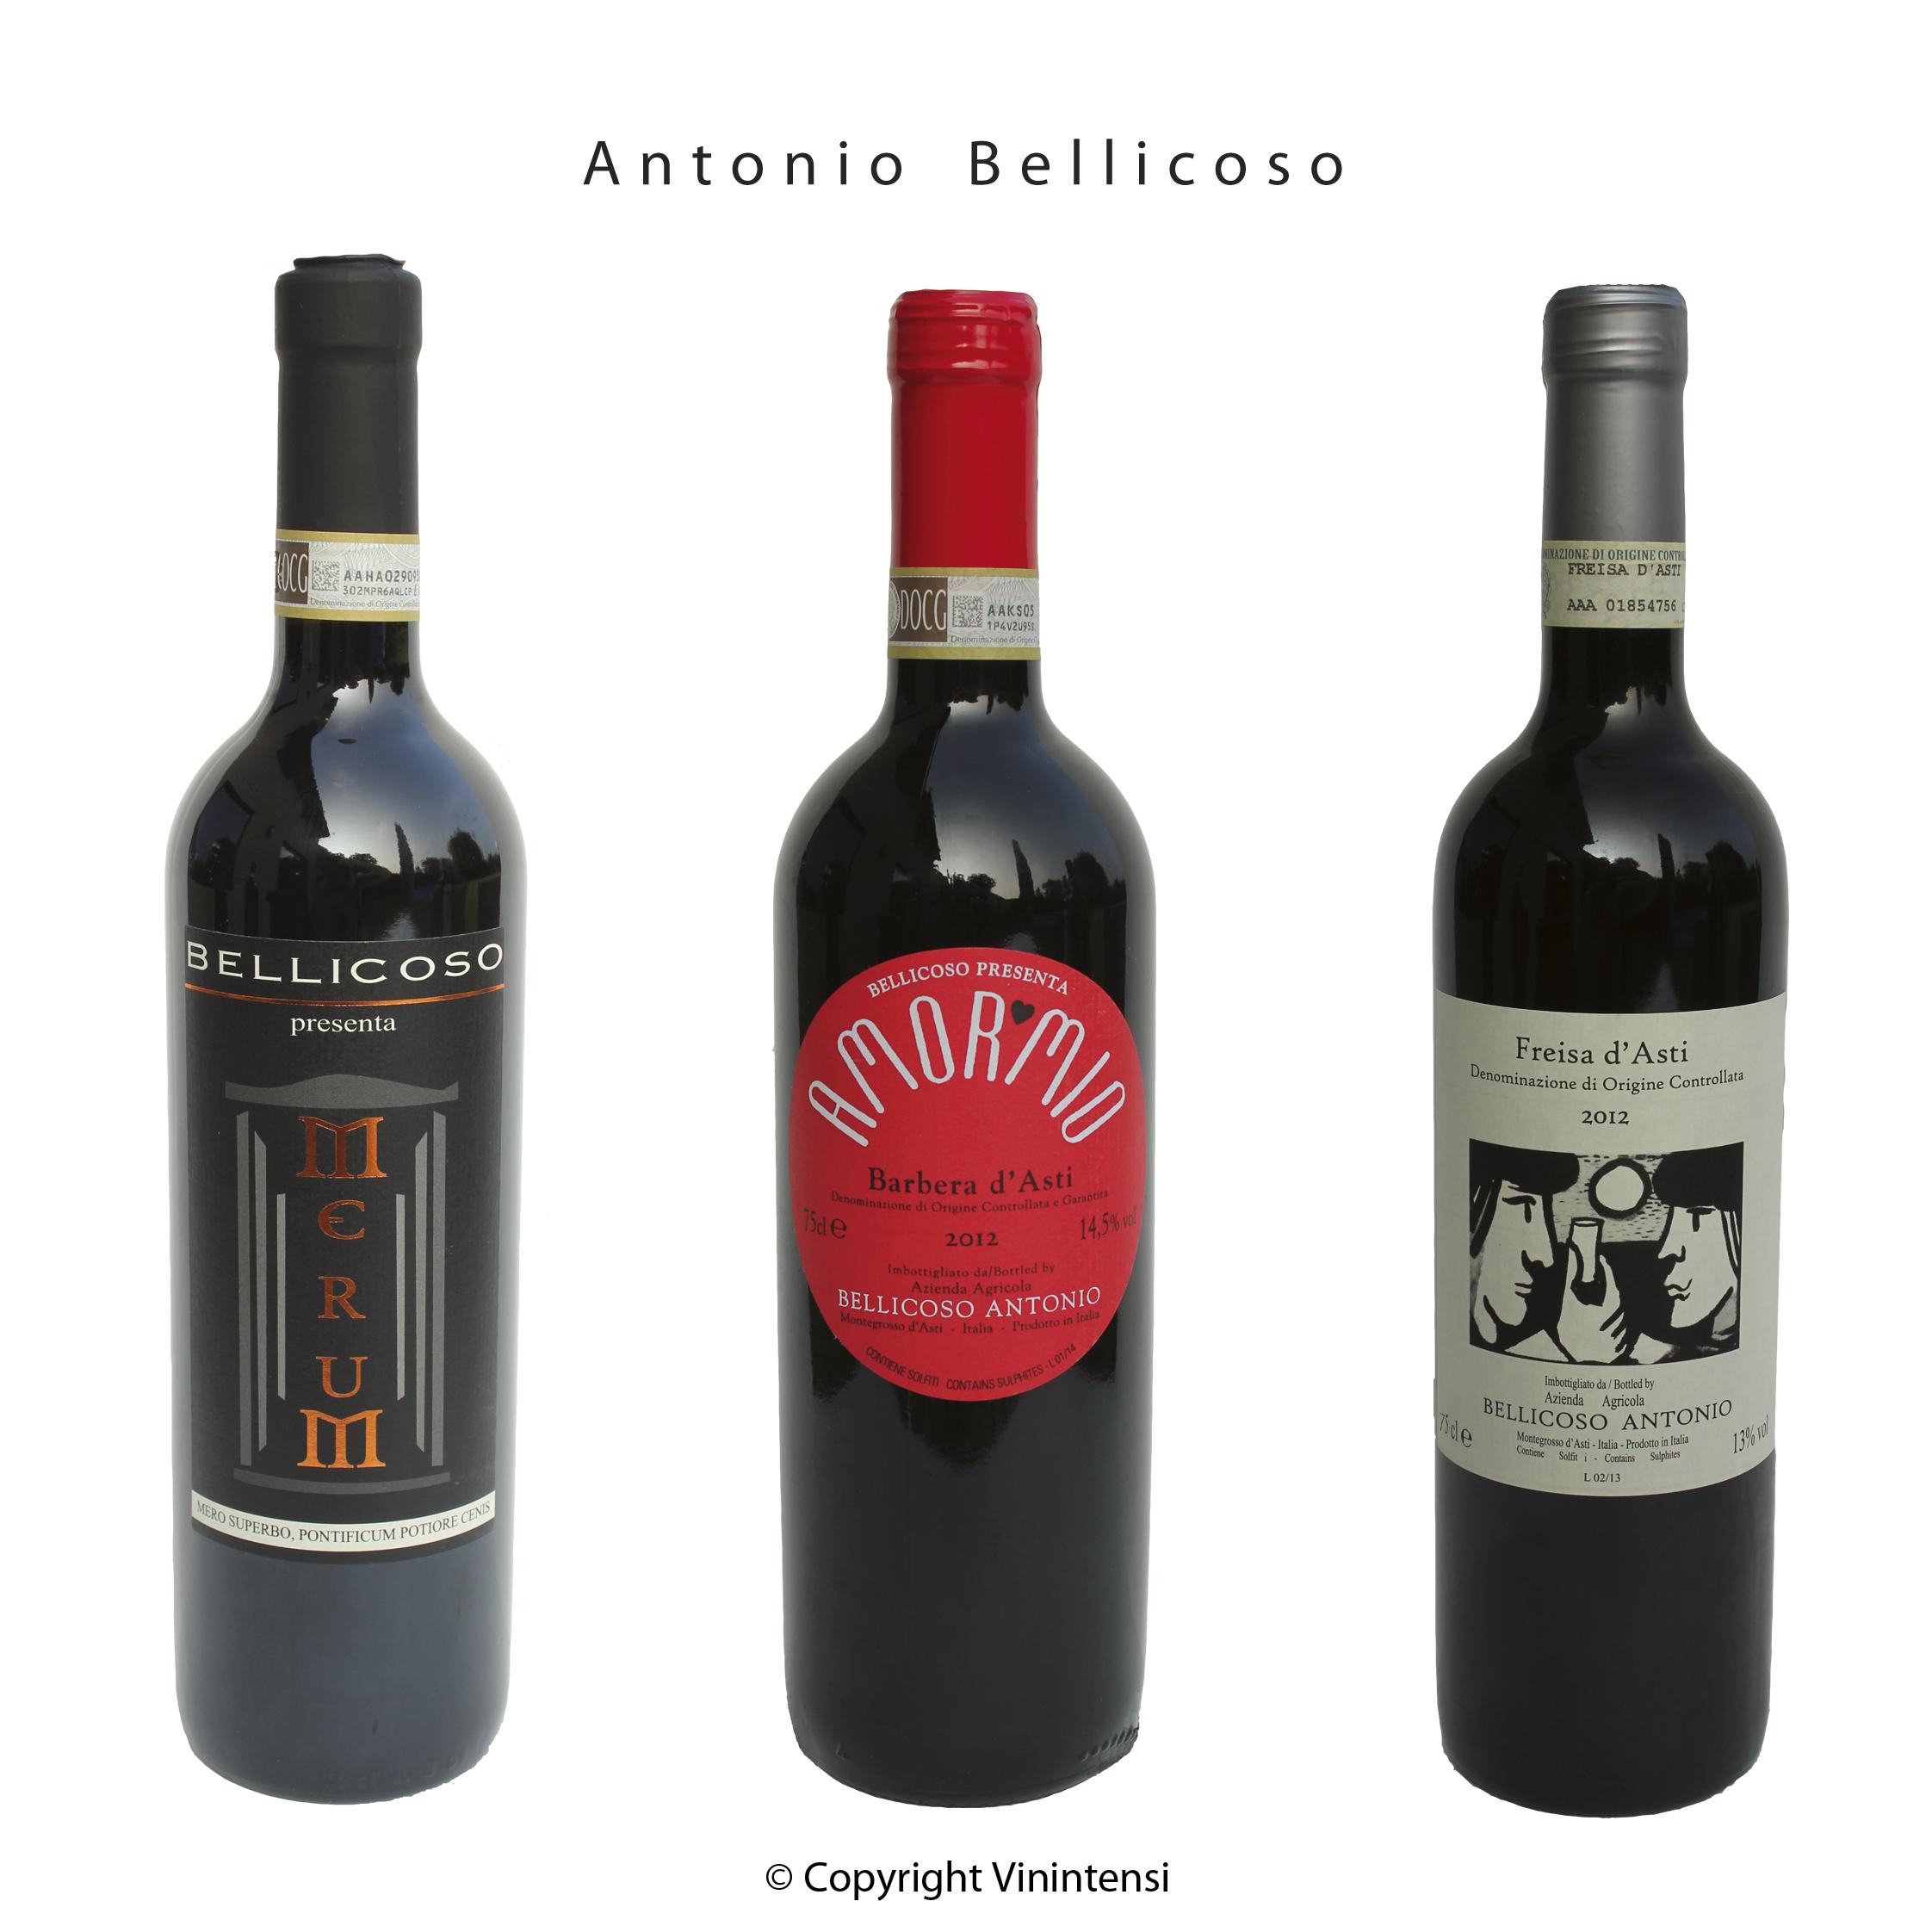 Produits Antonio Bellicoso